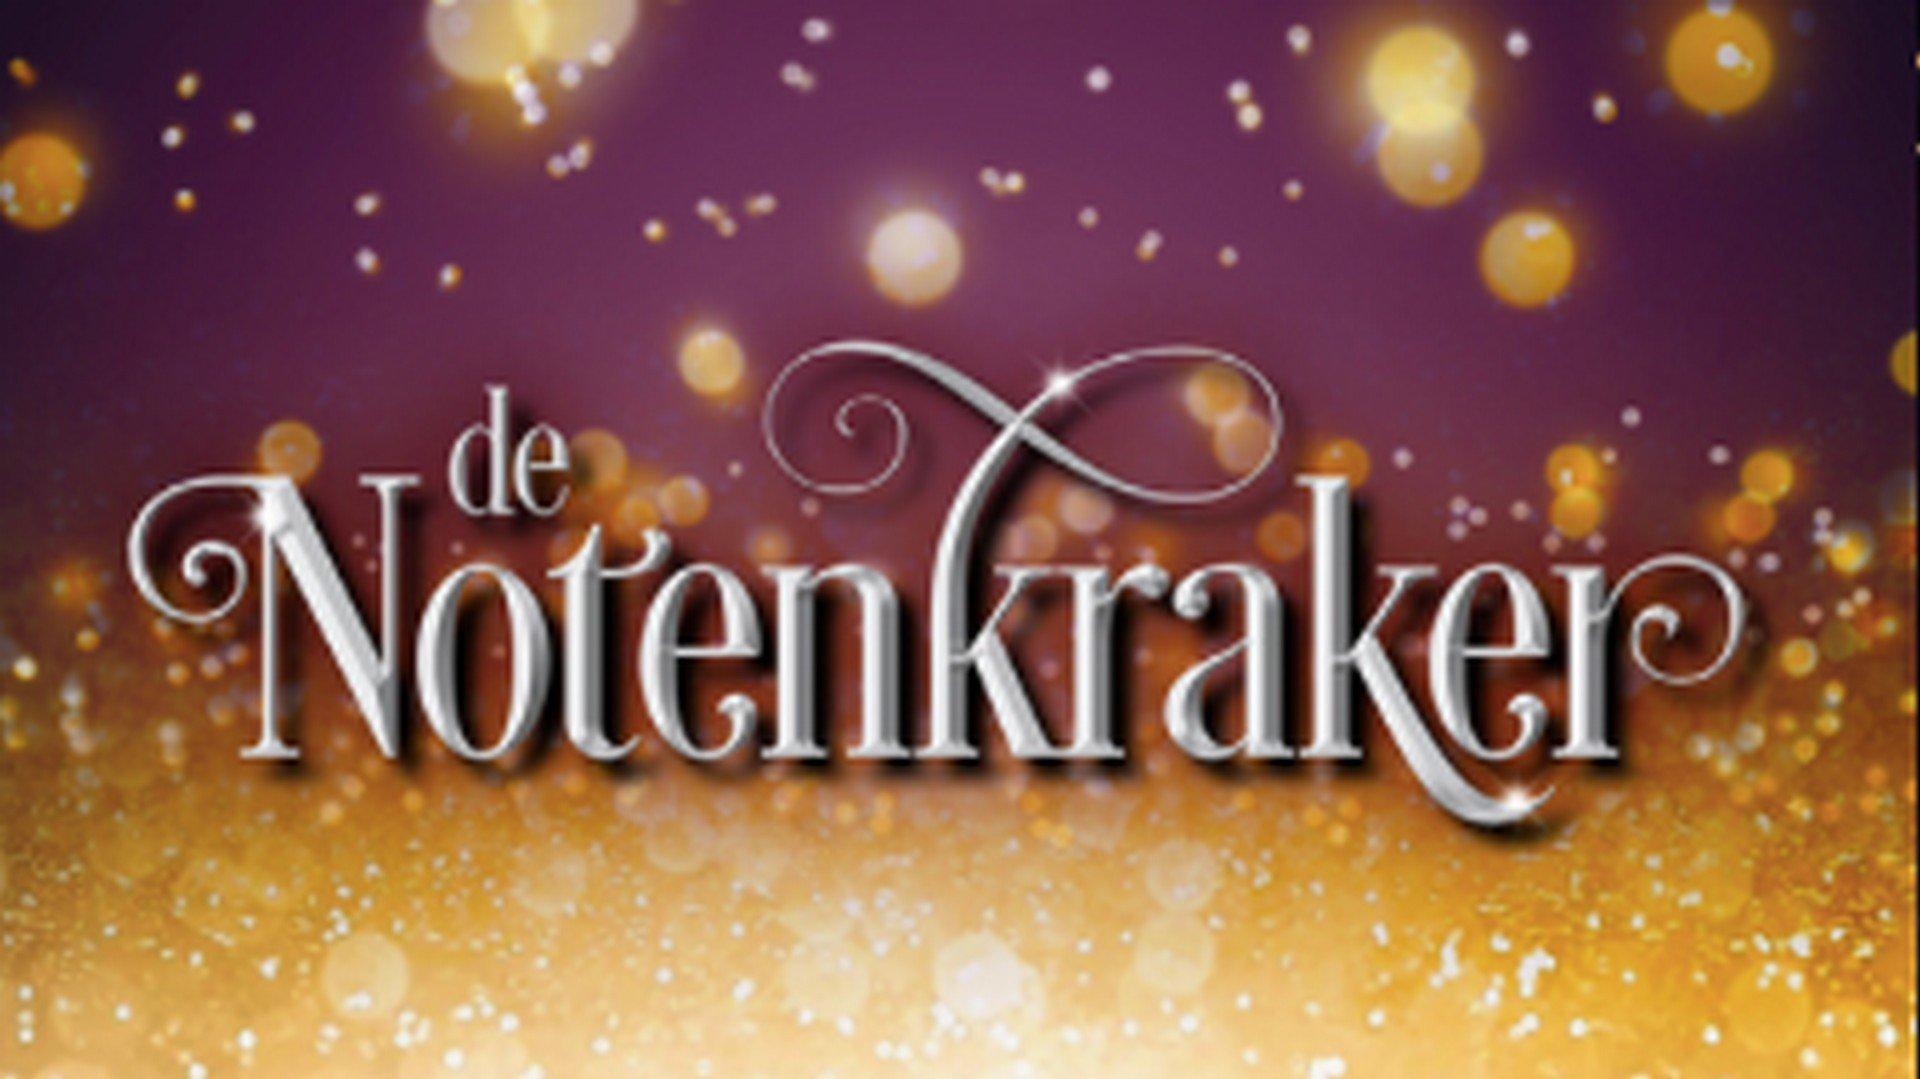 Music Hall Classics brengt prachtige balletten in seizoen 2018 - 2019 - De Notenkraker 1